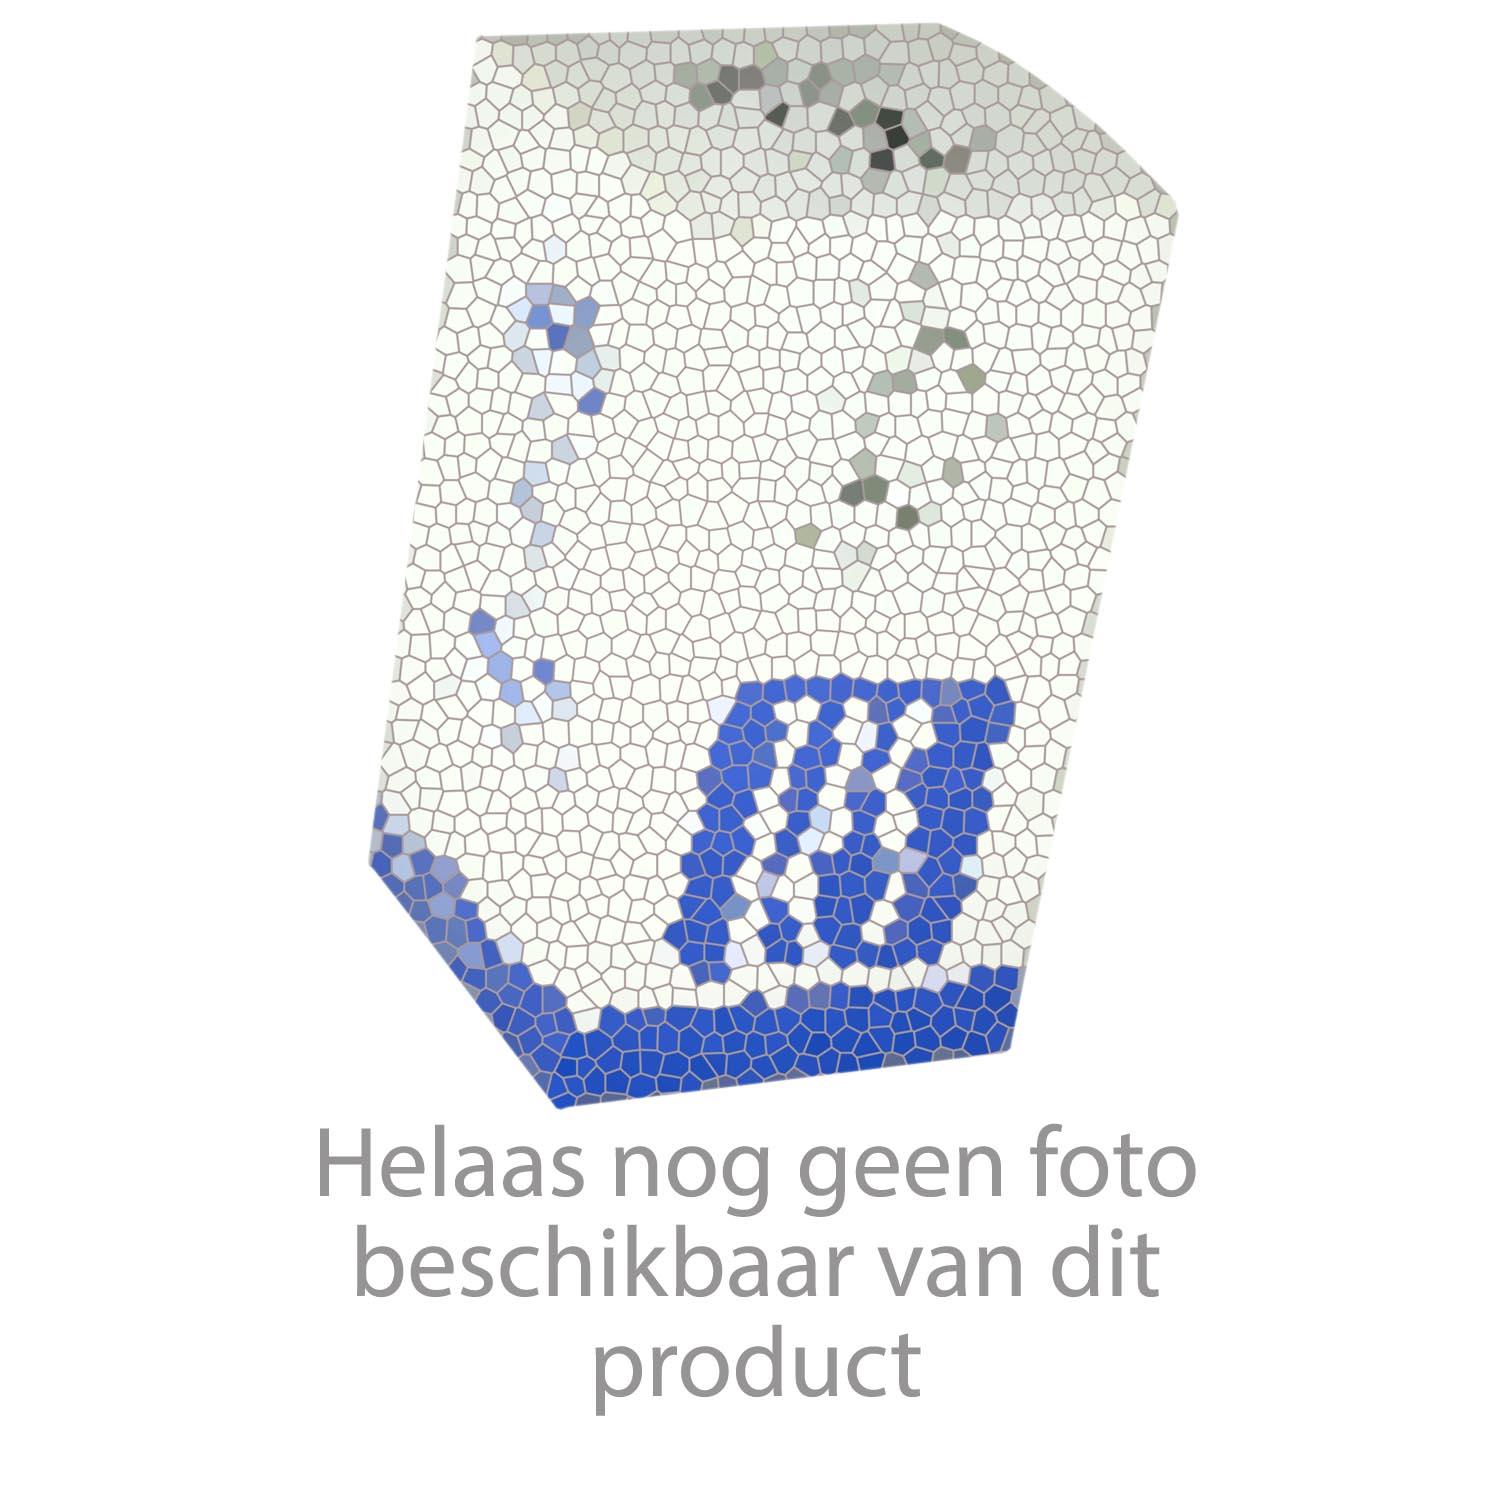 Kwc Onderdelen Ono Keukenkraan 2-Gats 1-Greeps Aparte Semipro Spoeldouche Artikelnummer 10.152.423.000Fl